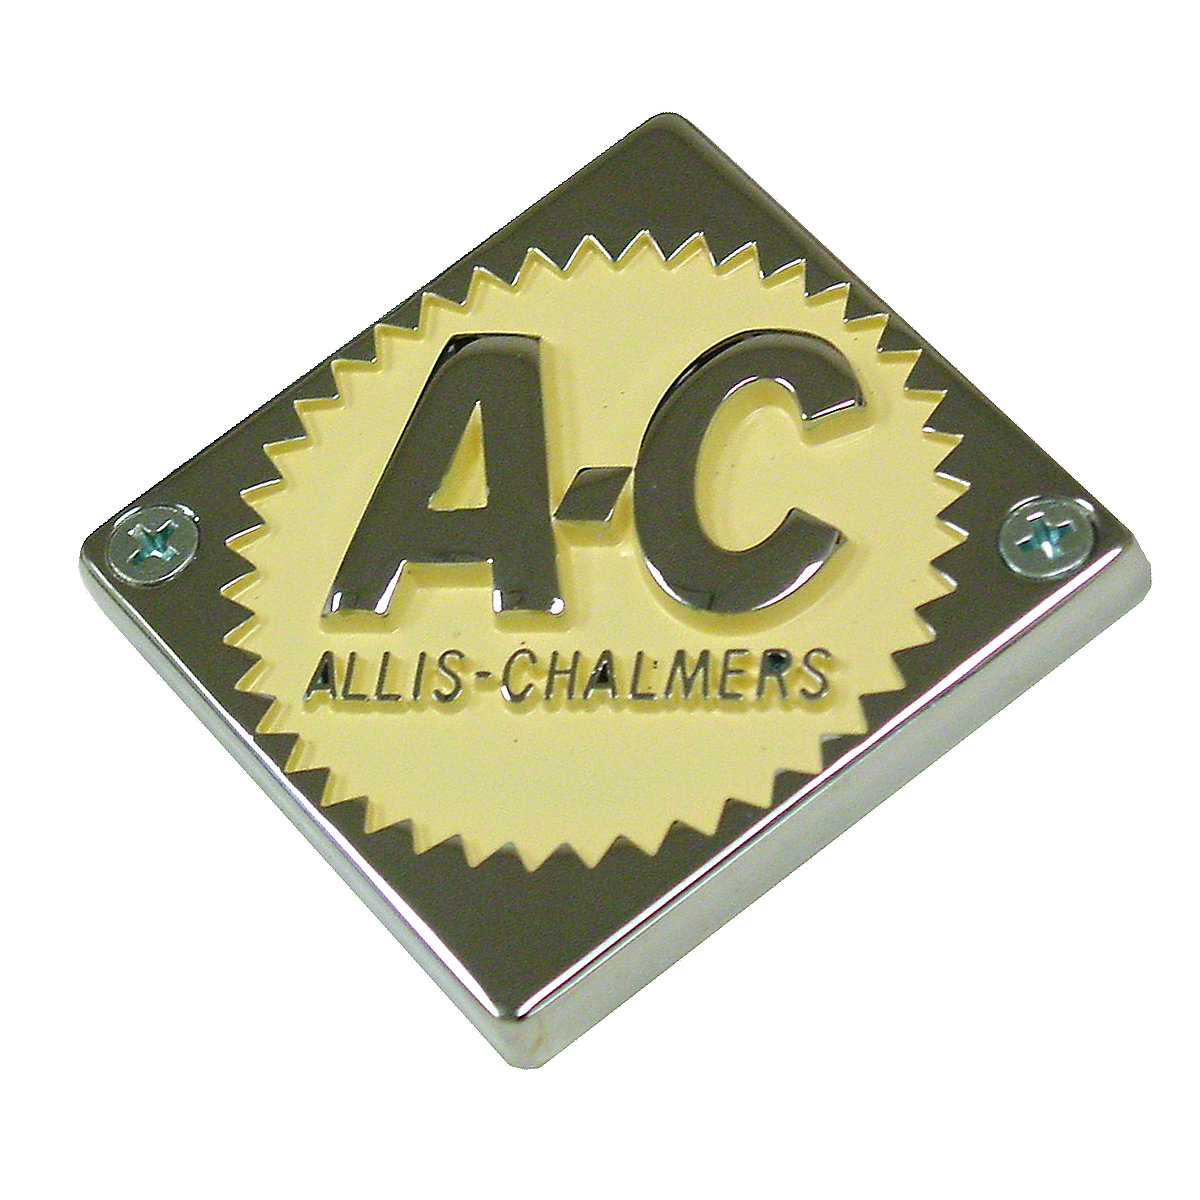 Steering Wheel Or Front Nose Emblem For Allis Chalmers: D10, D12, D14, D15, D19, D21, D17.